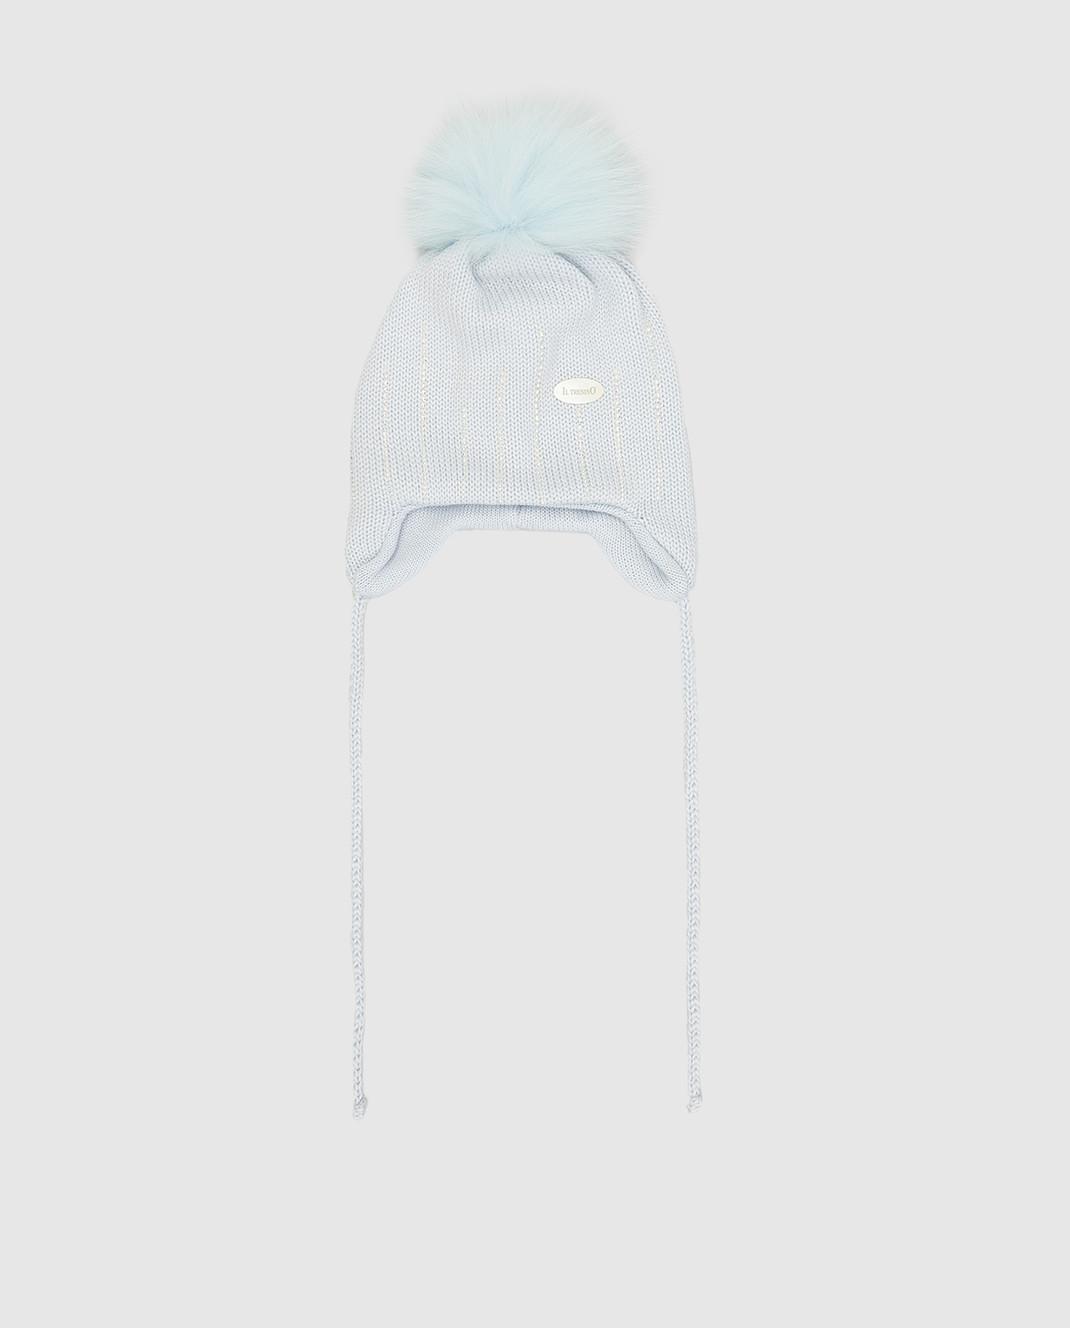 Il Trenino Детская голубая шапка из шерсти изображение 1